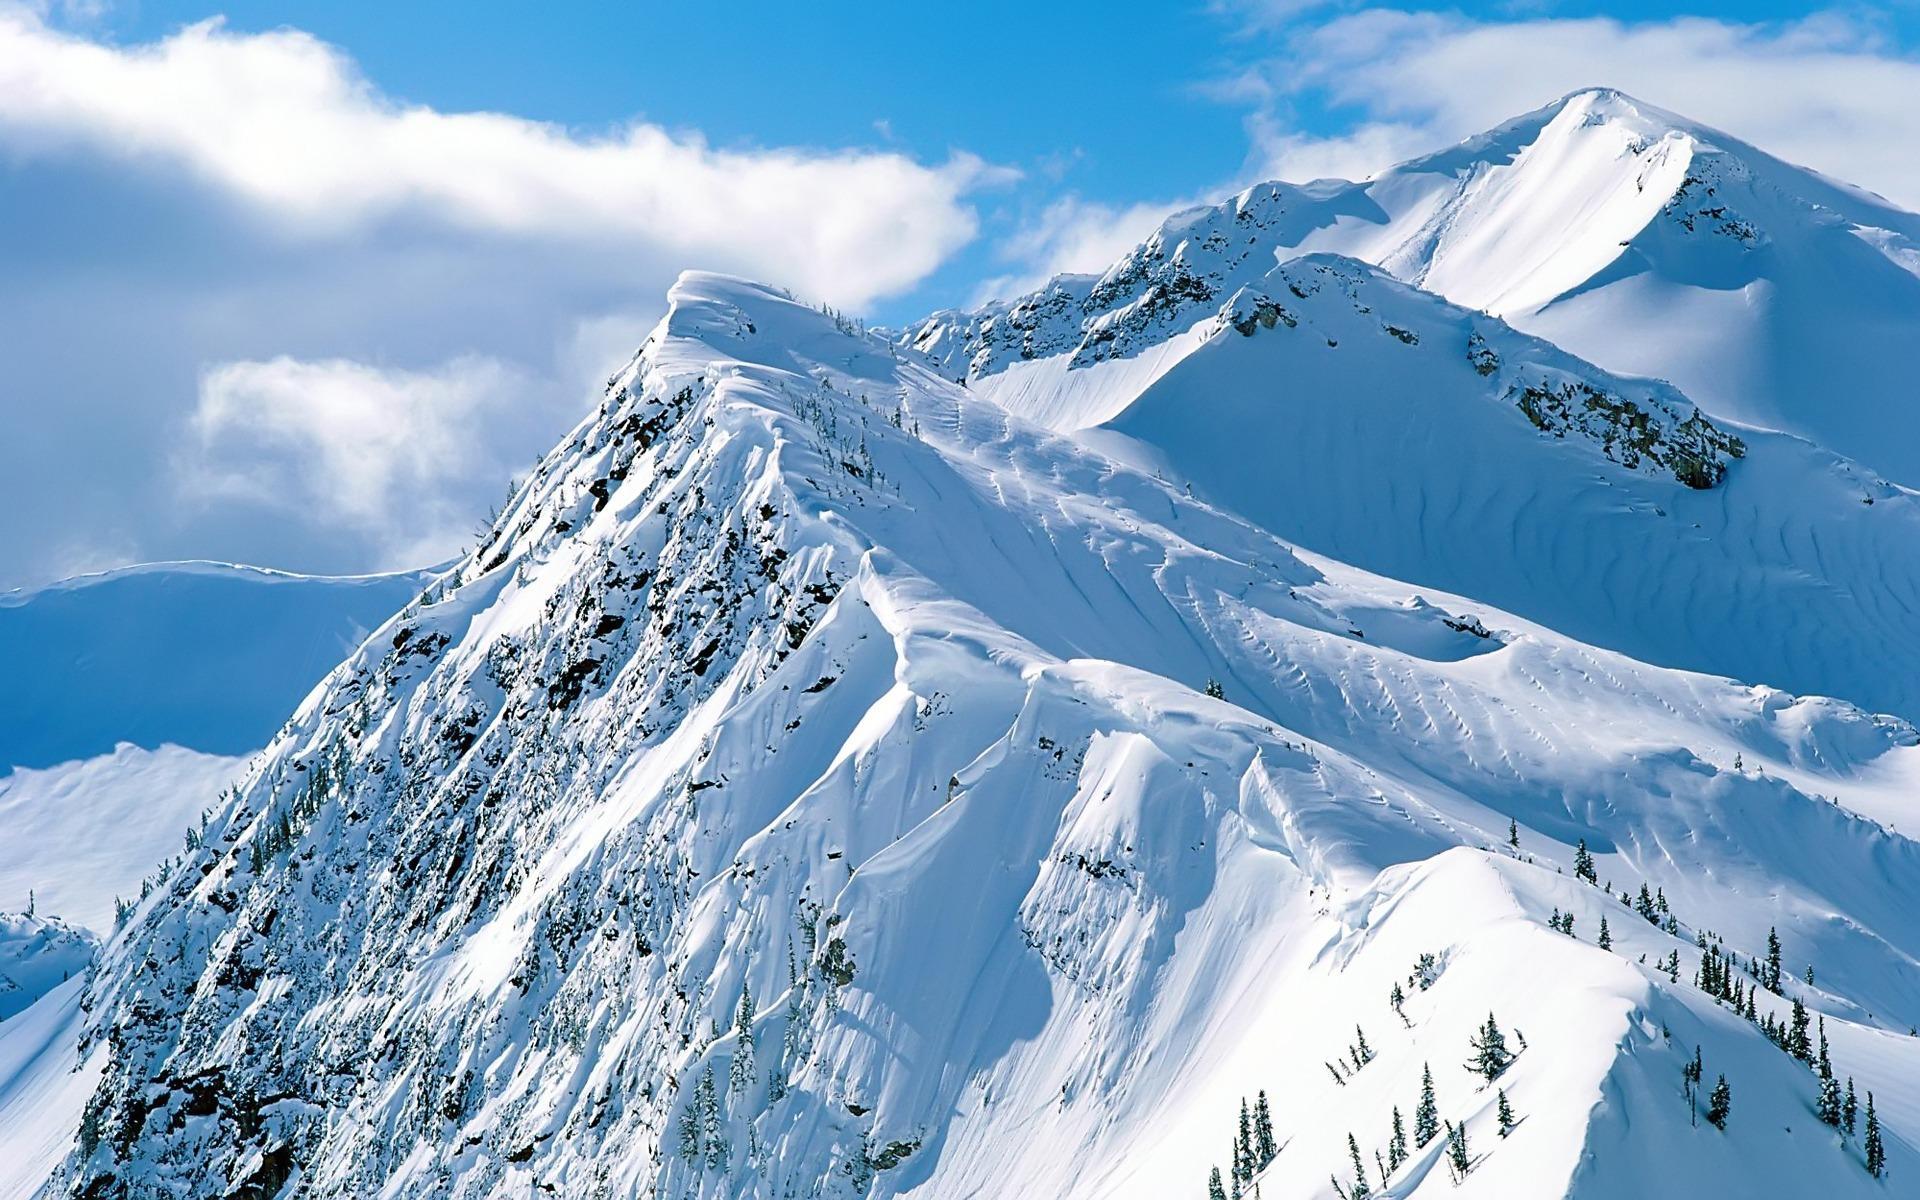 The Mountains Cime_neve